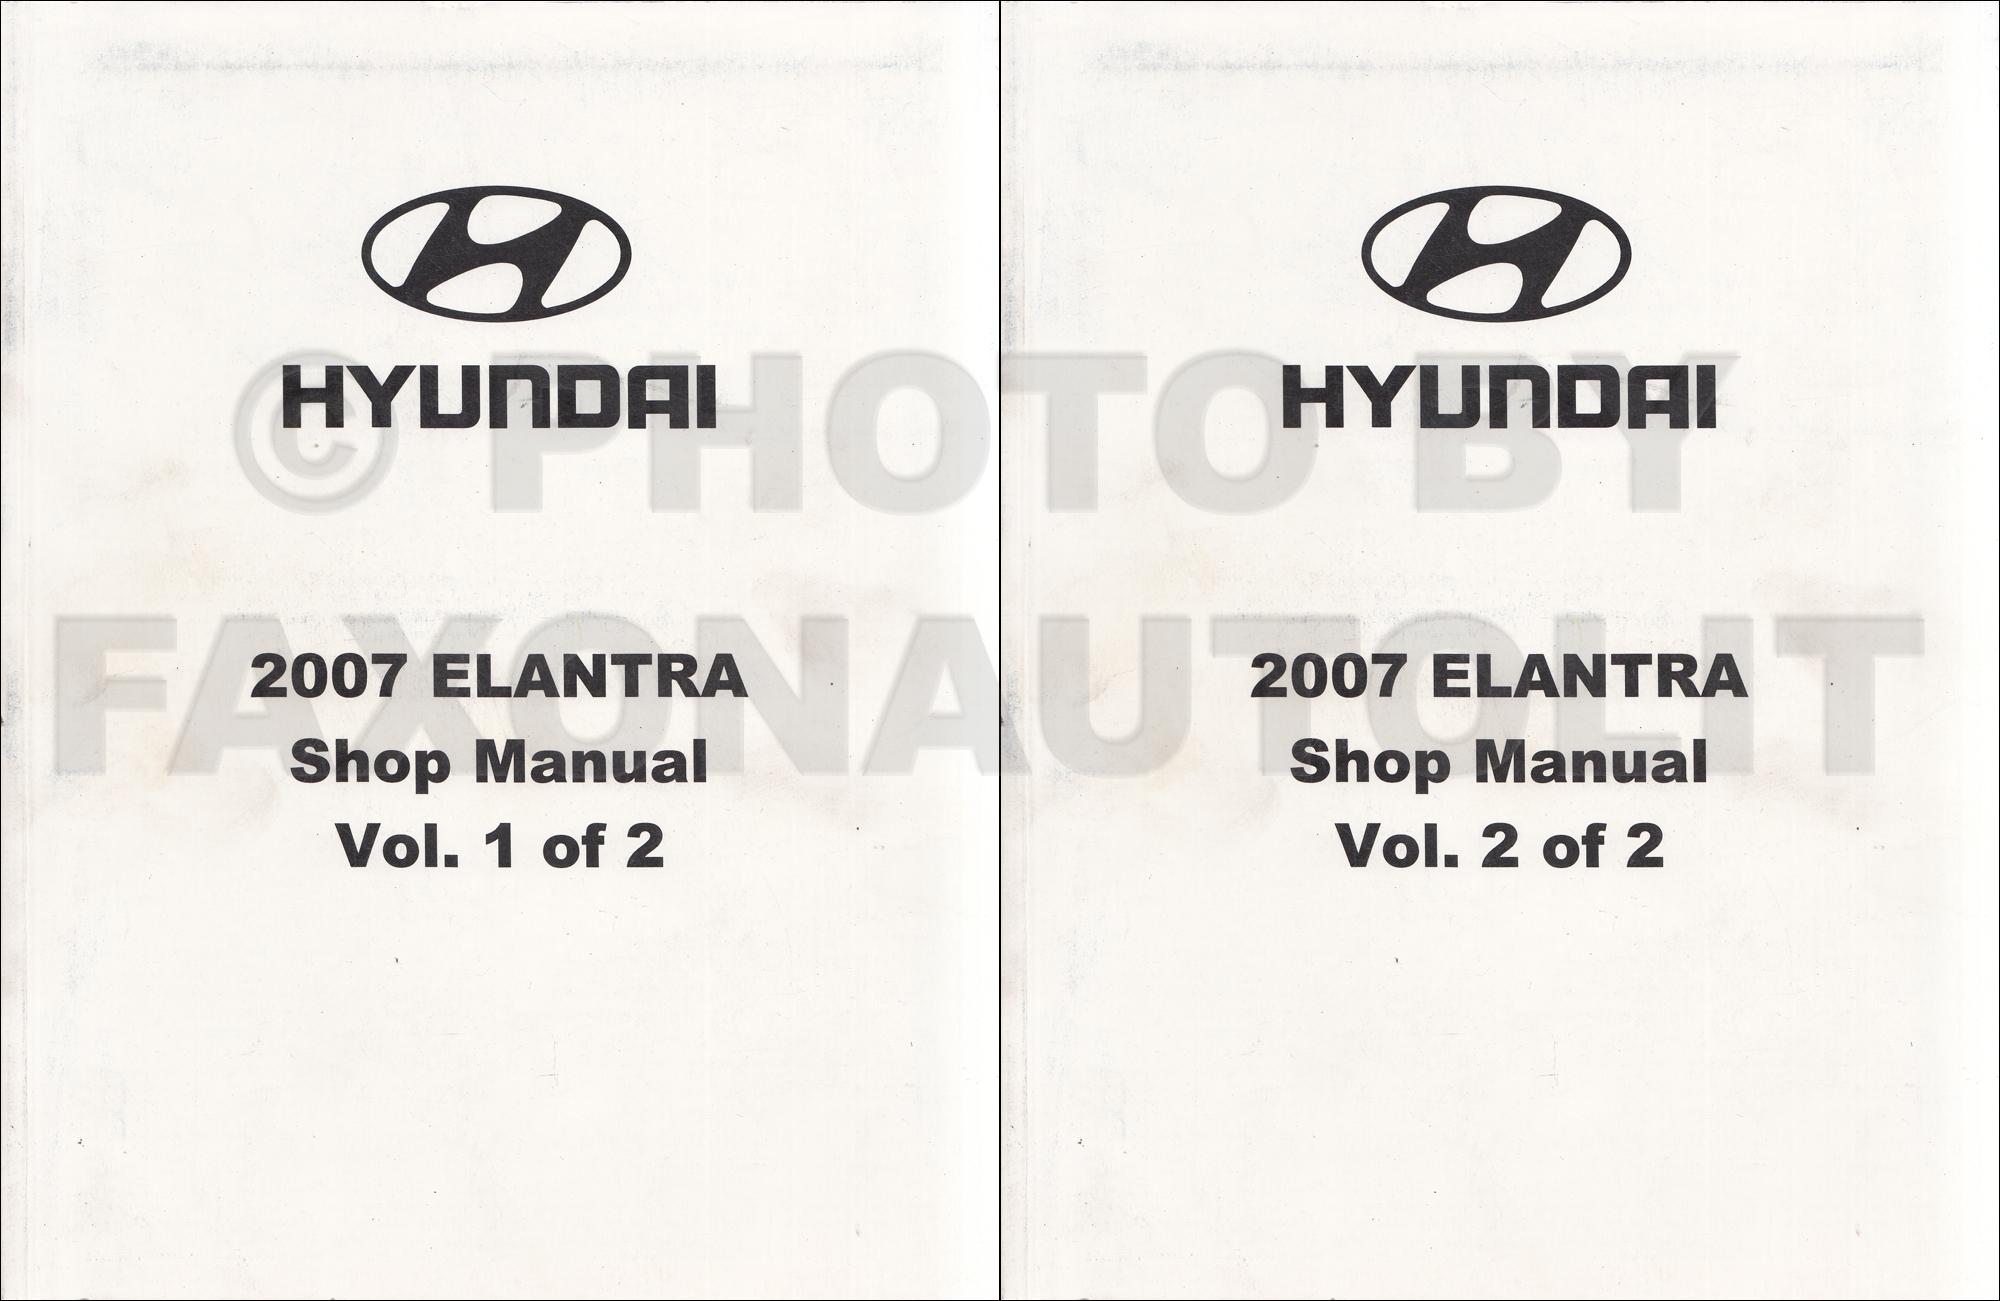 Hyundai Elantra Electrical Troubleshooting Manual